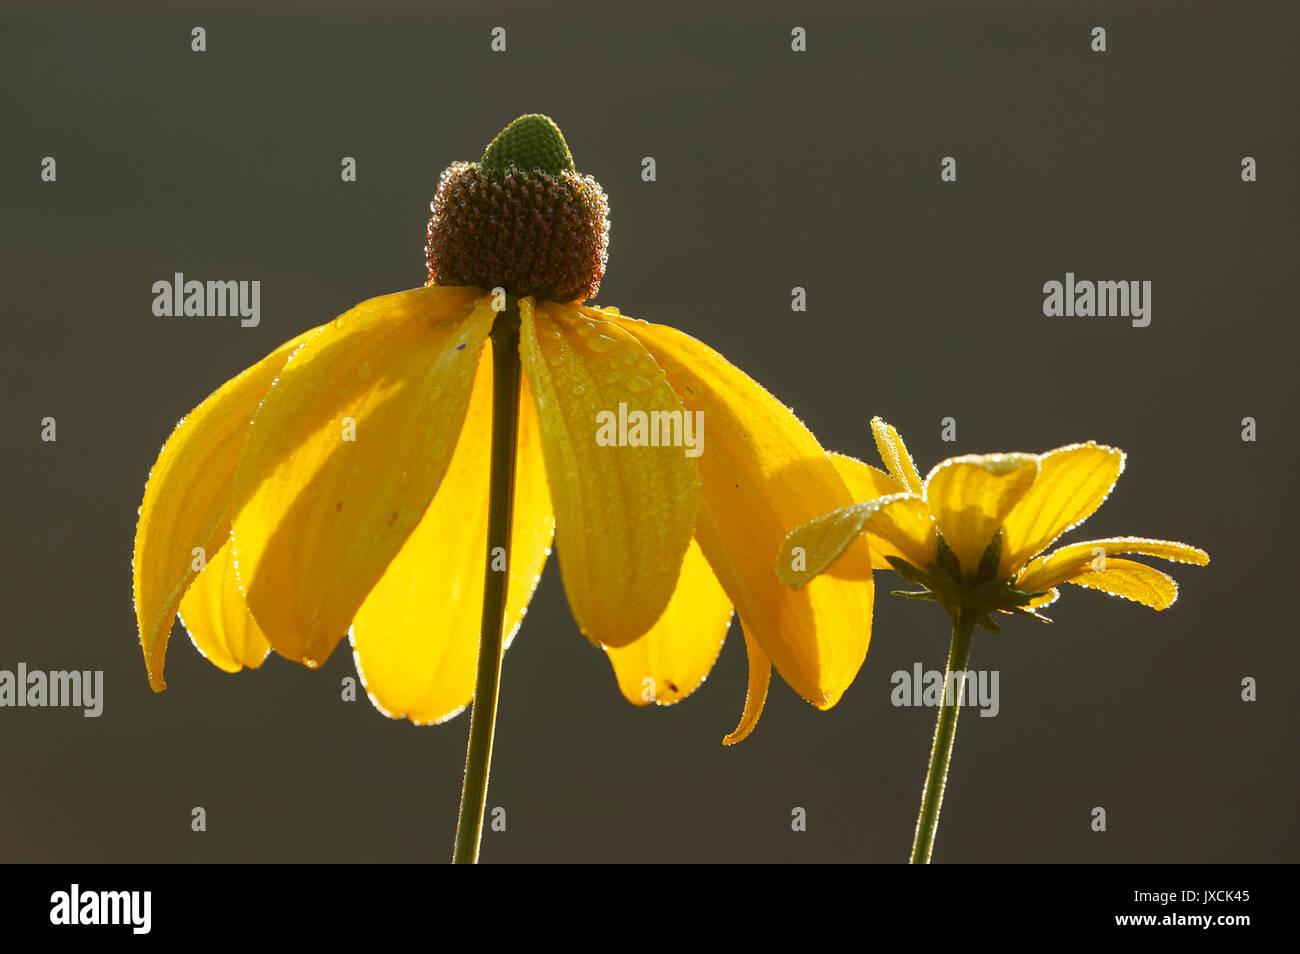 Shiny Coneflower 'Autumn Sun' / (Rudbeckia nitida)  | Fallschirm-Sonnenhut 'Herbstsonne' / (Rudbeckia nitida) - Stock Image